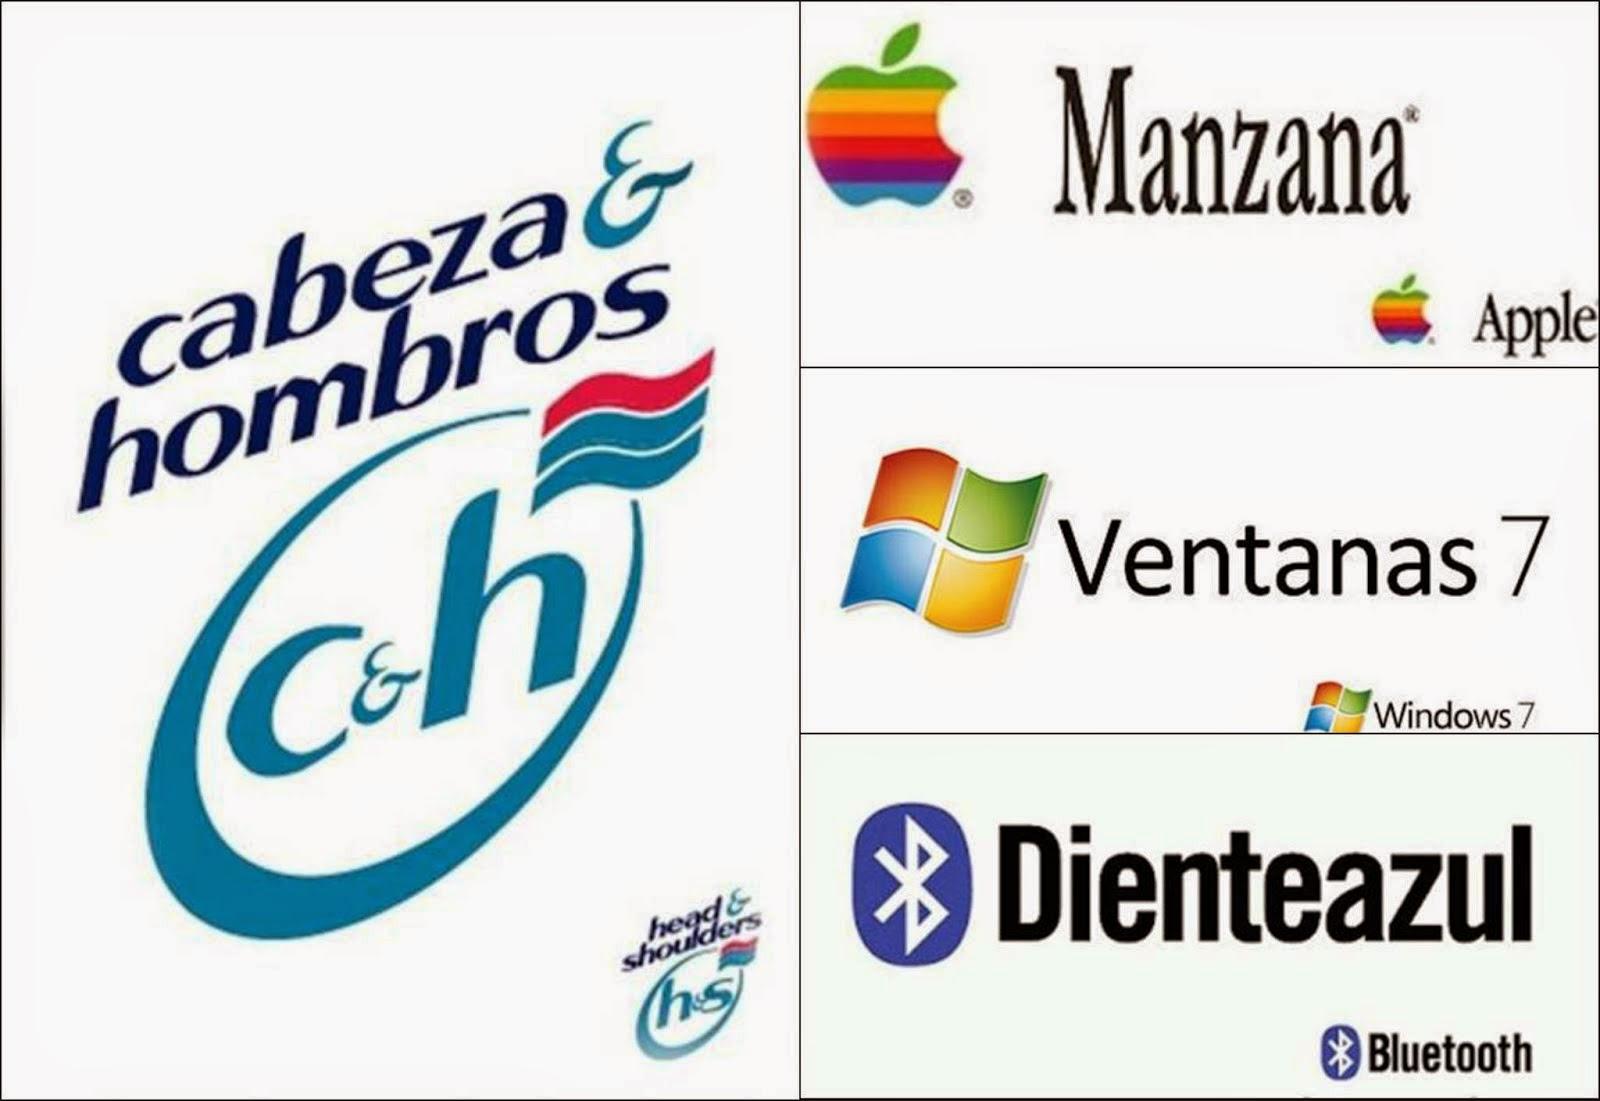 Nieuwe merknamen in Colombia